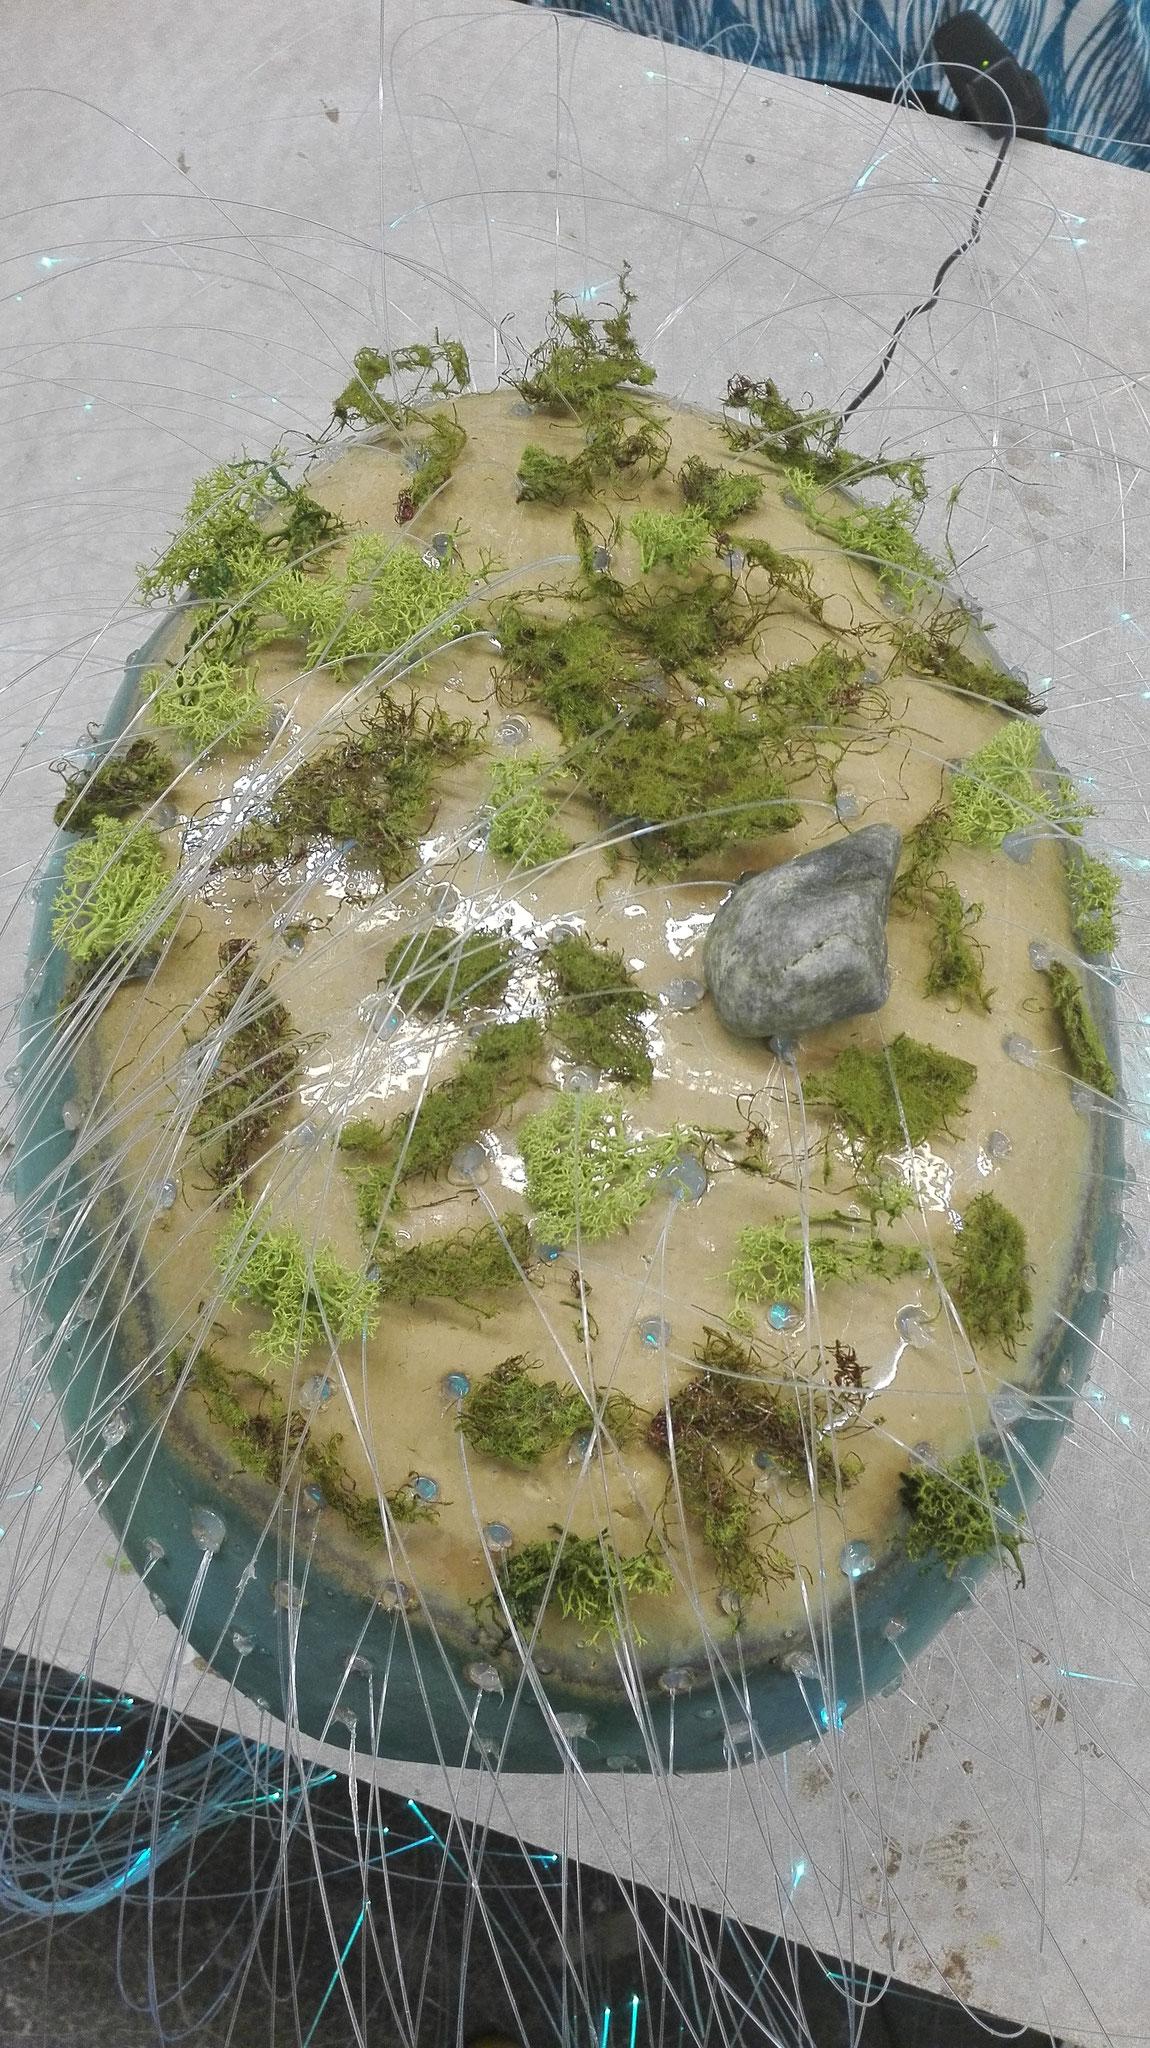 vivere Protozoa [begrünter Einzeller] | [planted protozoa] © 2017 created by Juliane Leitner